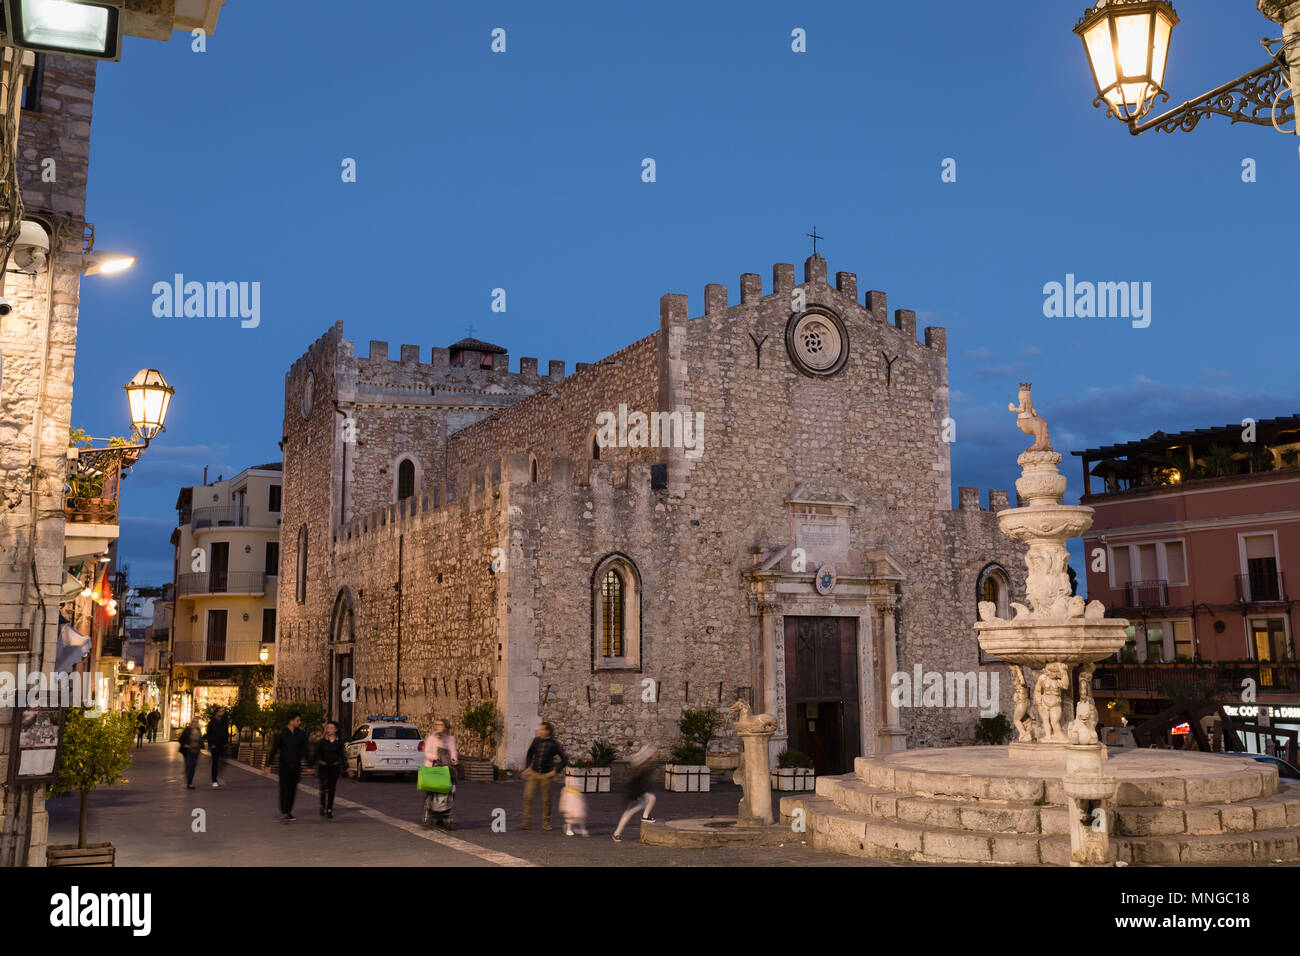 Duomo (Cathedral) of Taormina, Sicily. - Stock Image